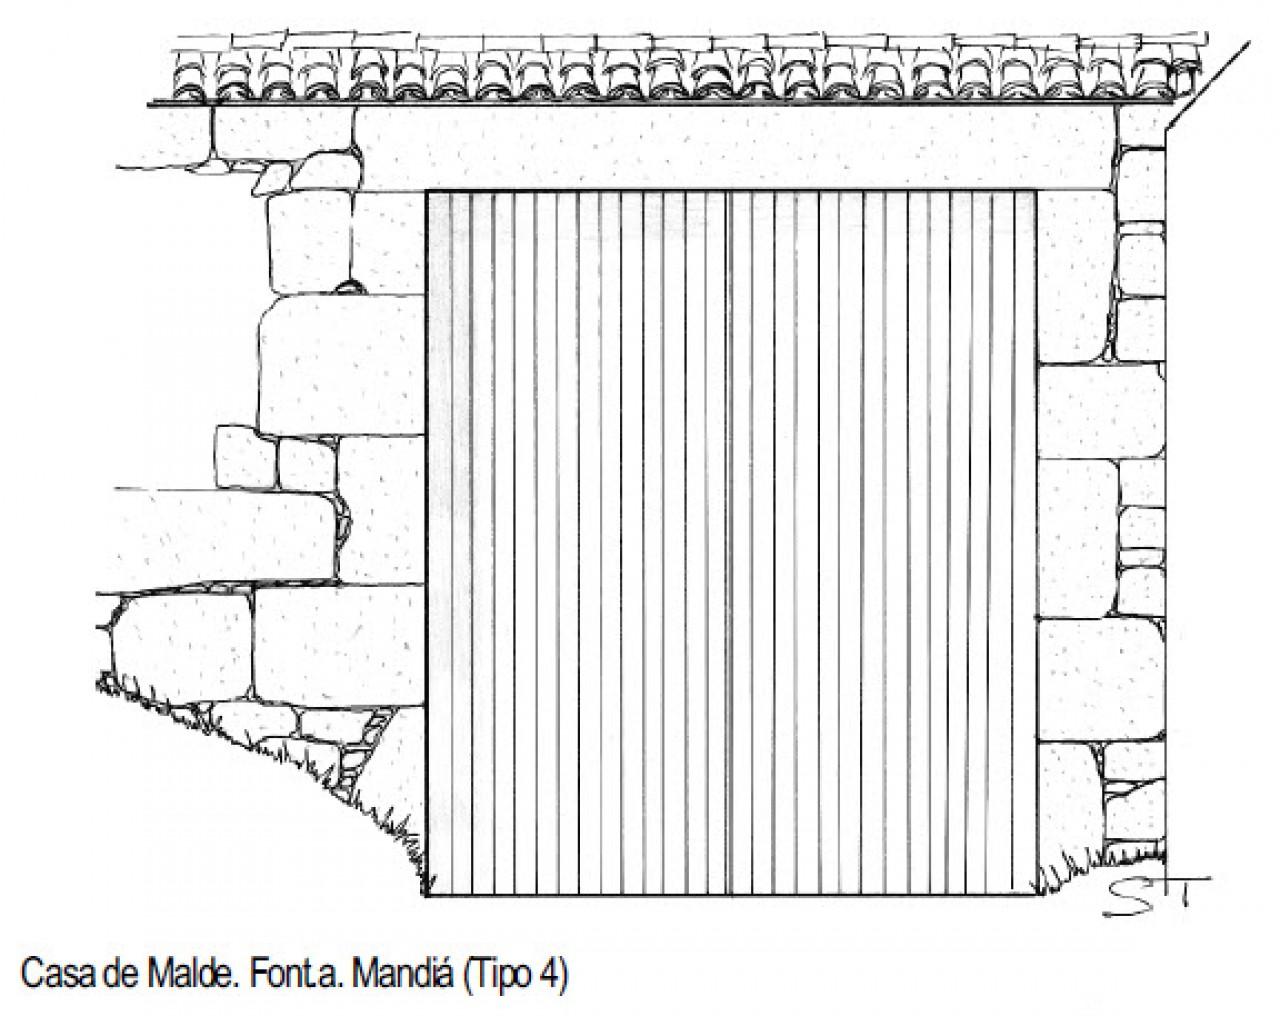 portalon-tipo-4-casa-de-malde-fonta-mandia-b